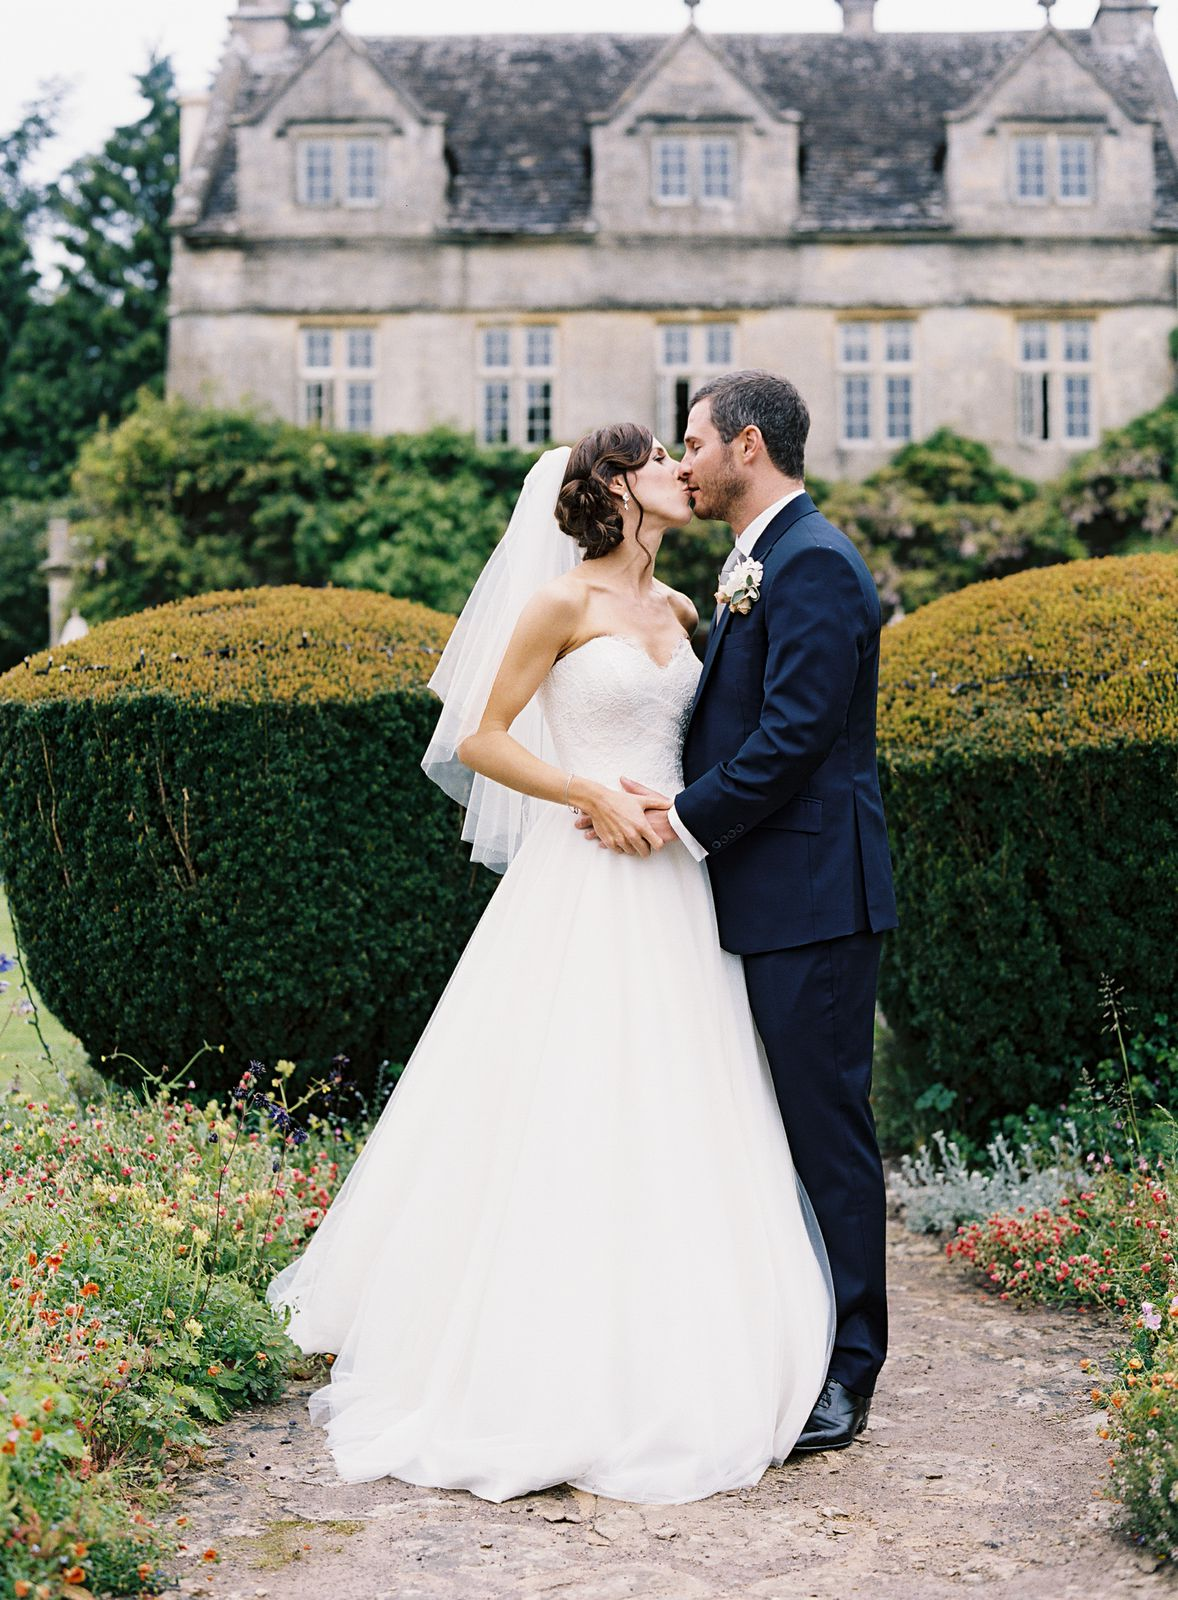 Suzanne Neville Real bride ,uj5zYKye0D2d3-tk-t_2-12mS-jhekvPQ822TwTzecQ